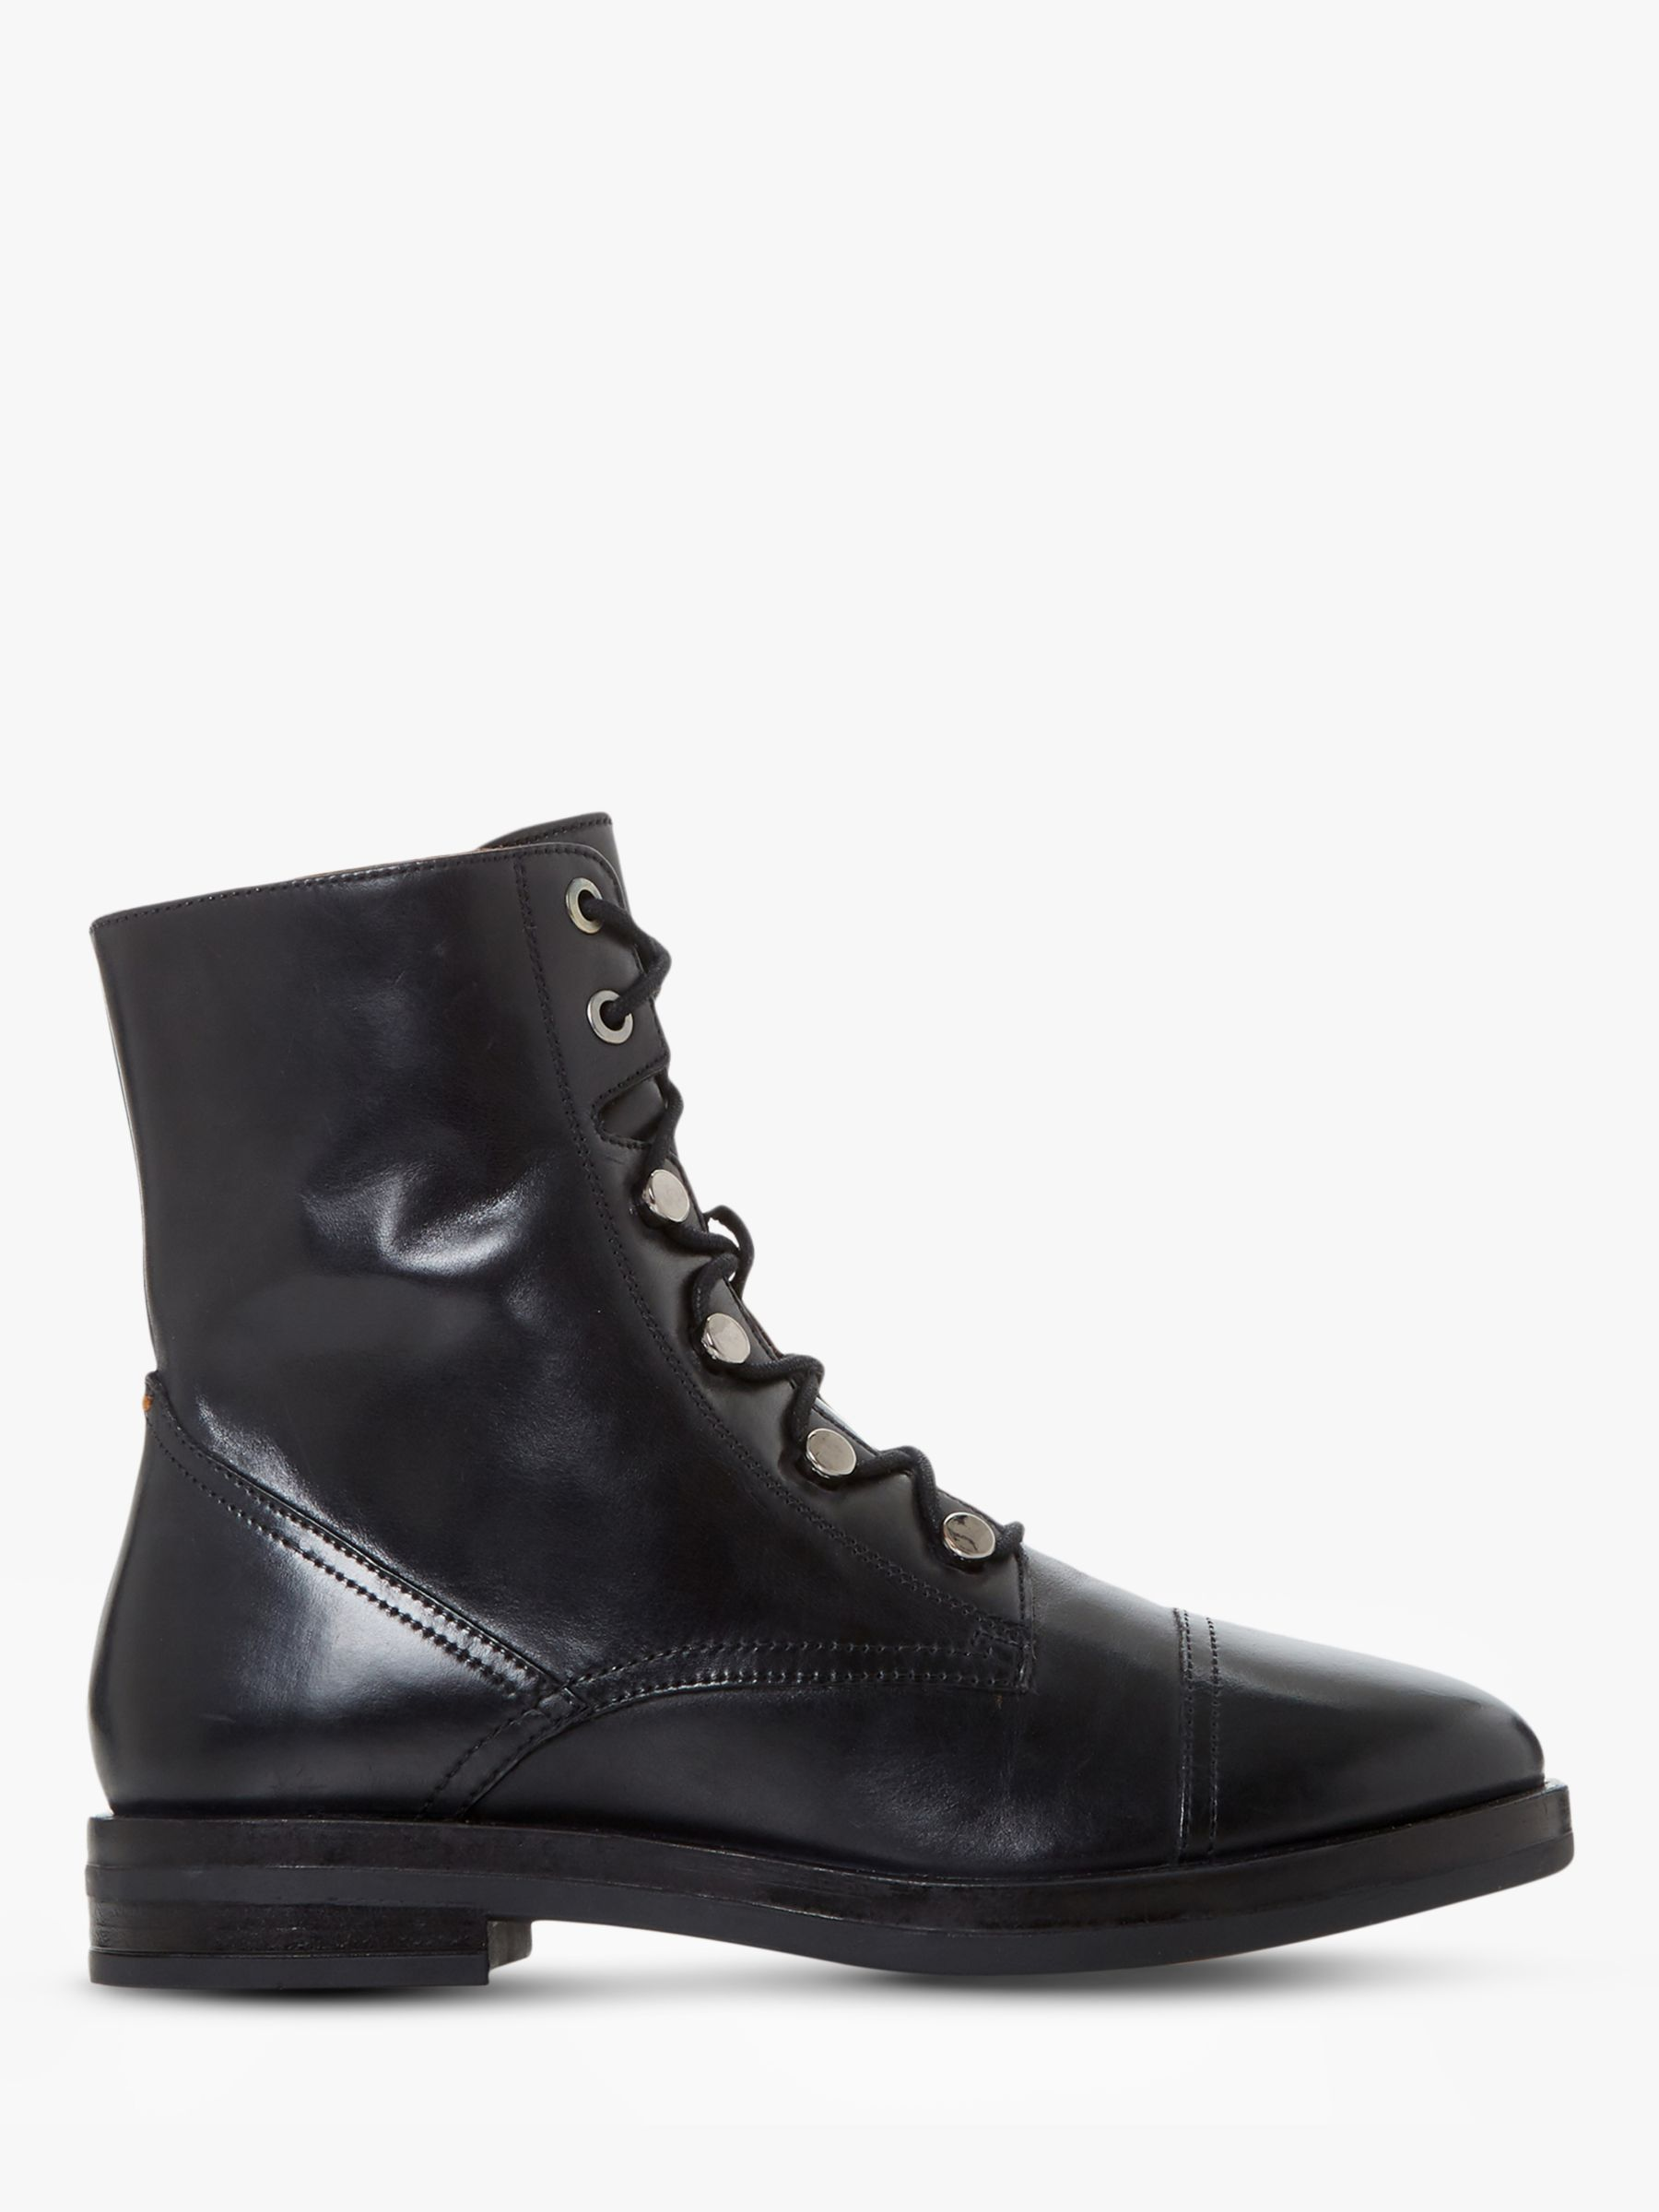 Bertie Bertie Peplume Leather Ranger Ankle Boots